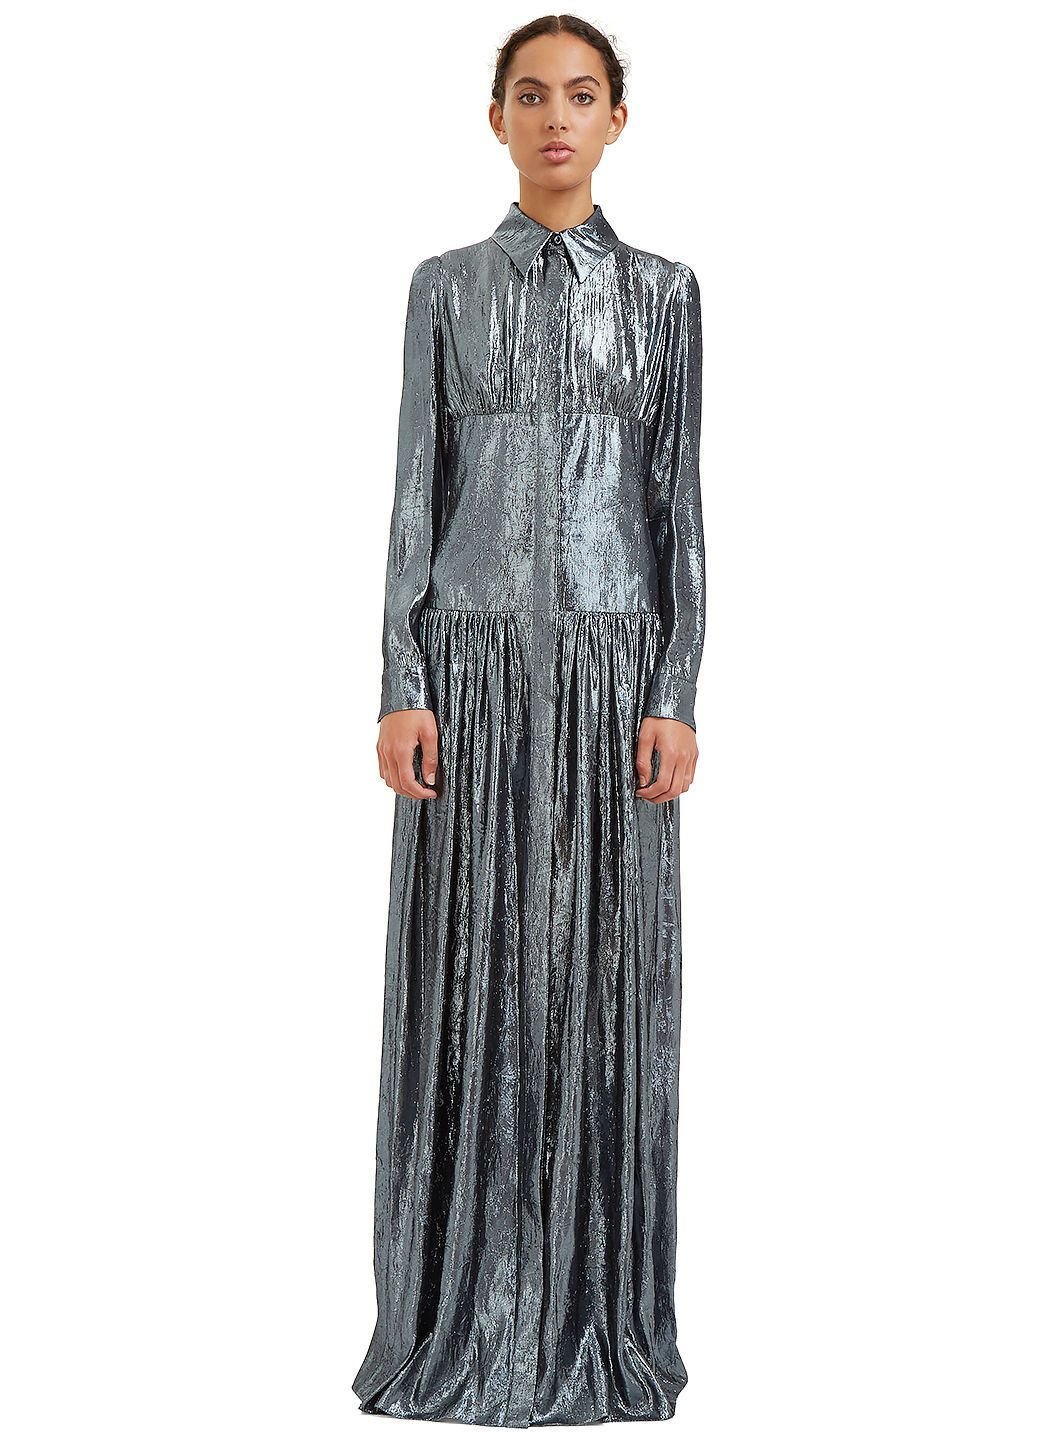 LANVIN Women'S Long Metallic Lurex Shirt Dress In Silver. #lanvin #cloth #